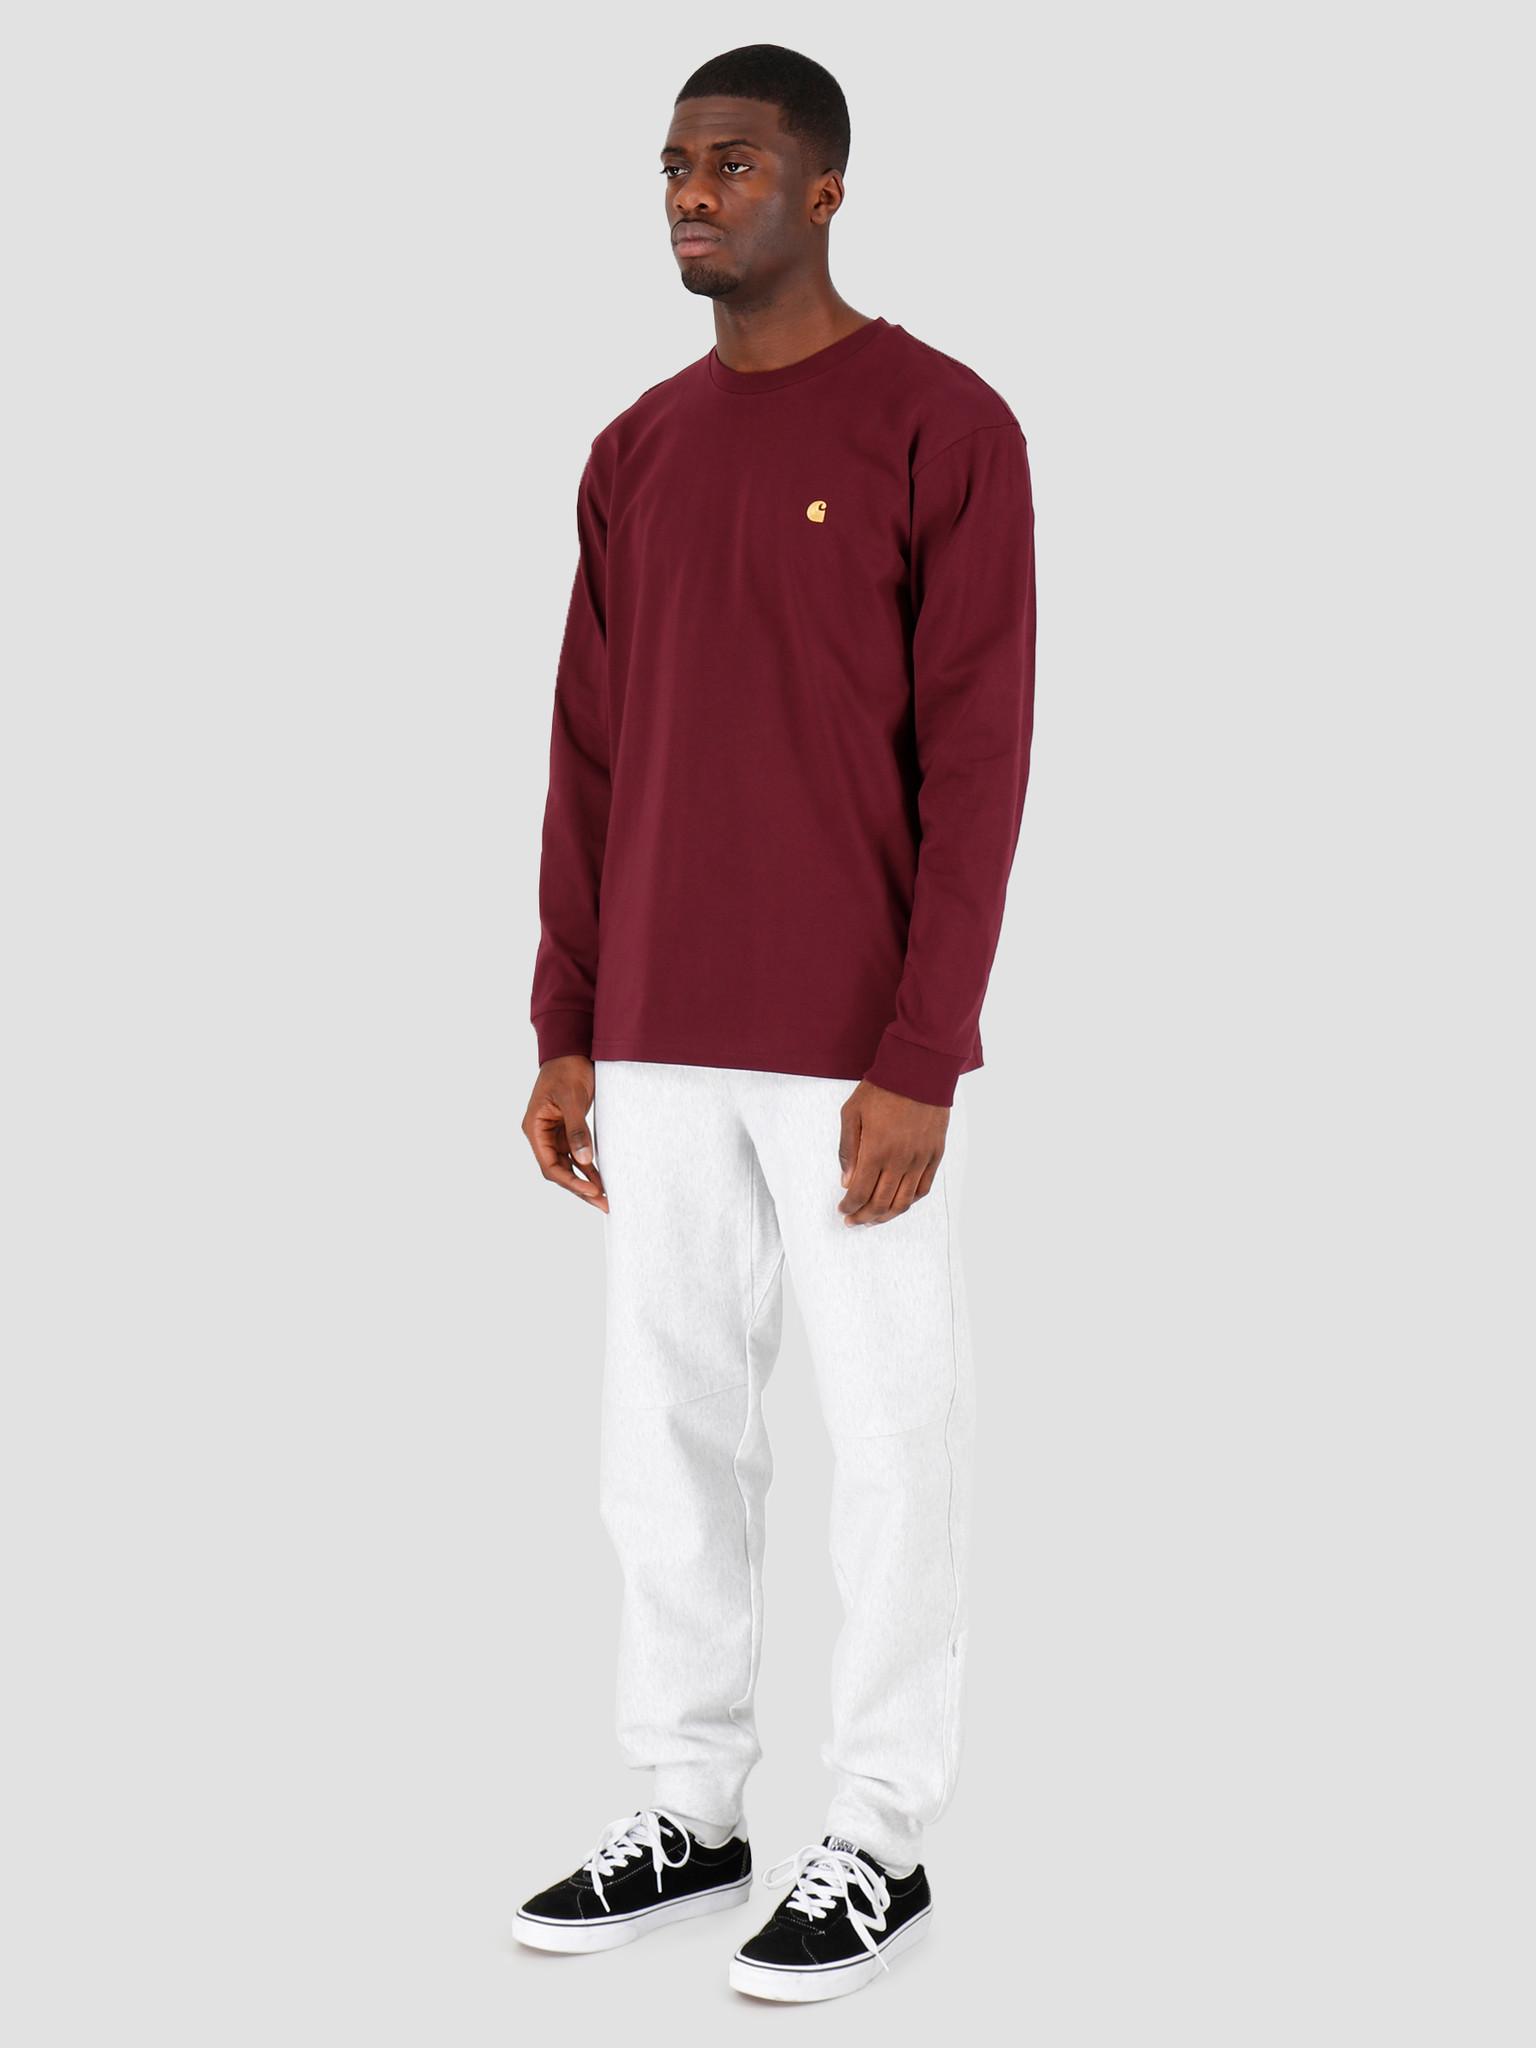 Carhartt WIP Carhartt WIP Chase T-Shirt Shiraz Gold I026392-08L90